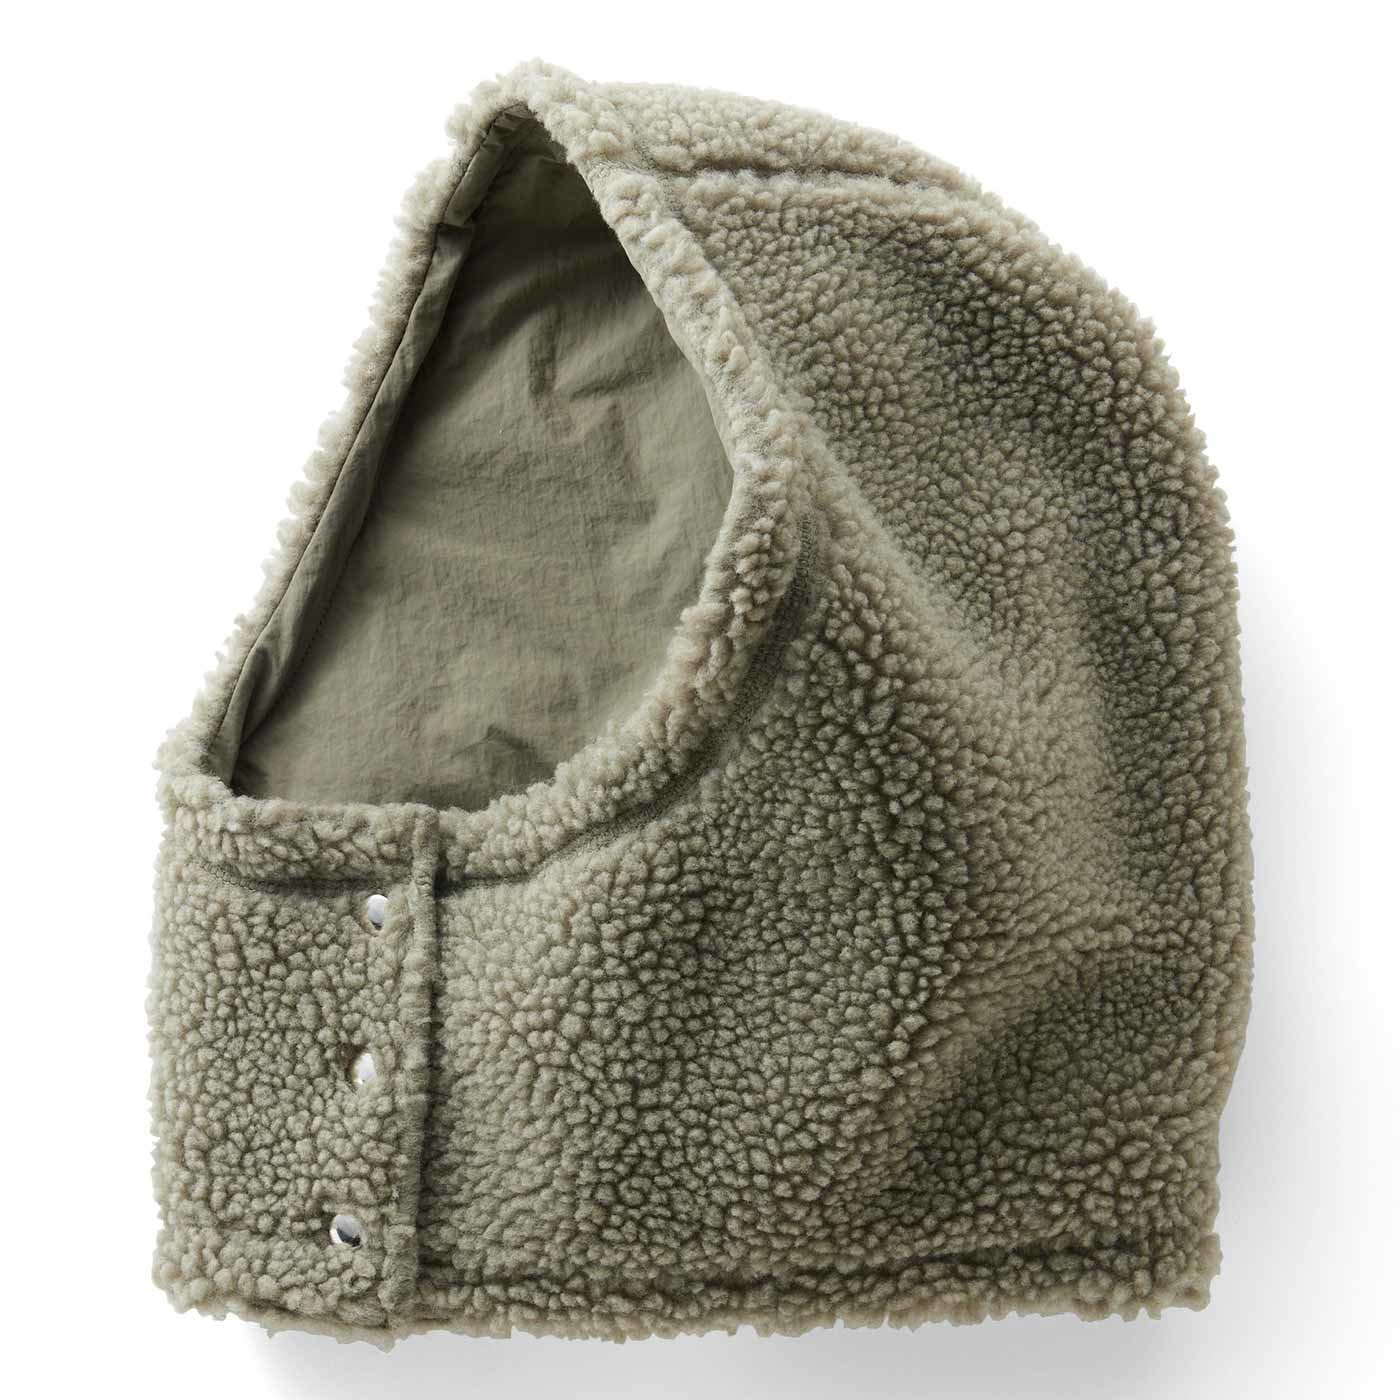 IEDIT[イディット] 暖かくコーデを盛り上げる ボア×撥水(はっすい)素材のリバーシブルフヌード〈スモーキーカーキ〉